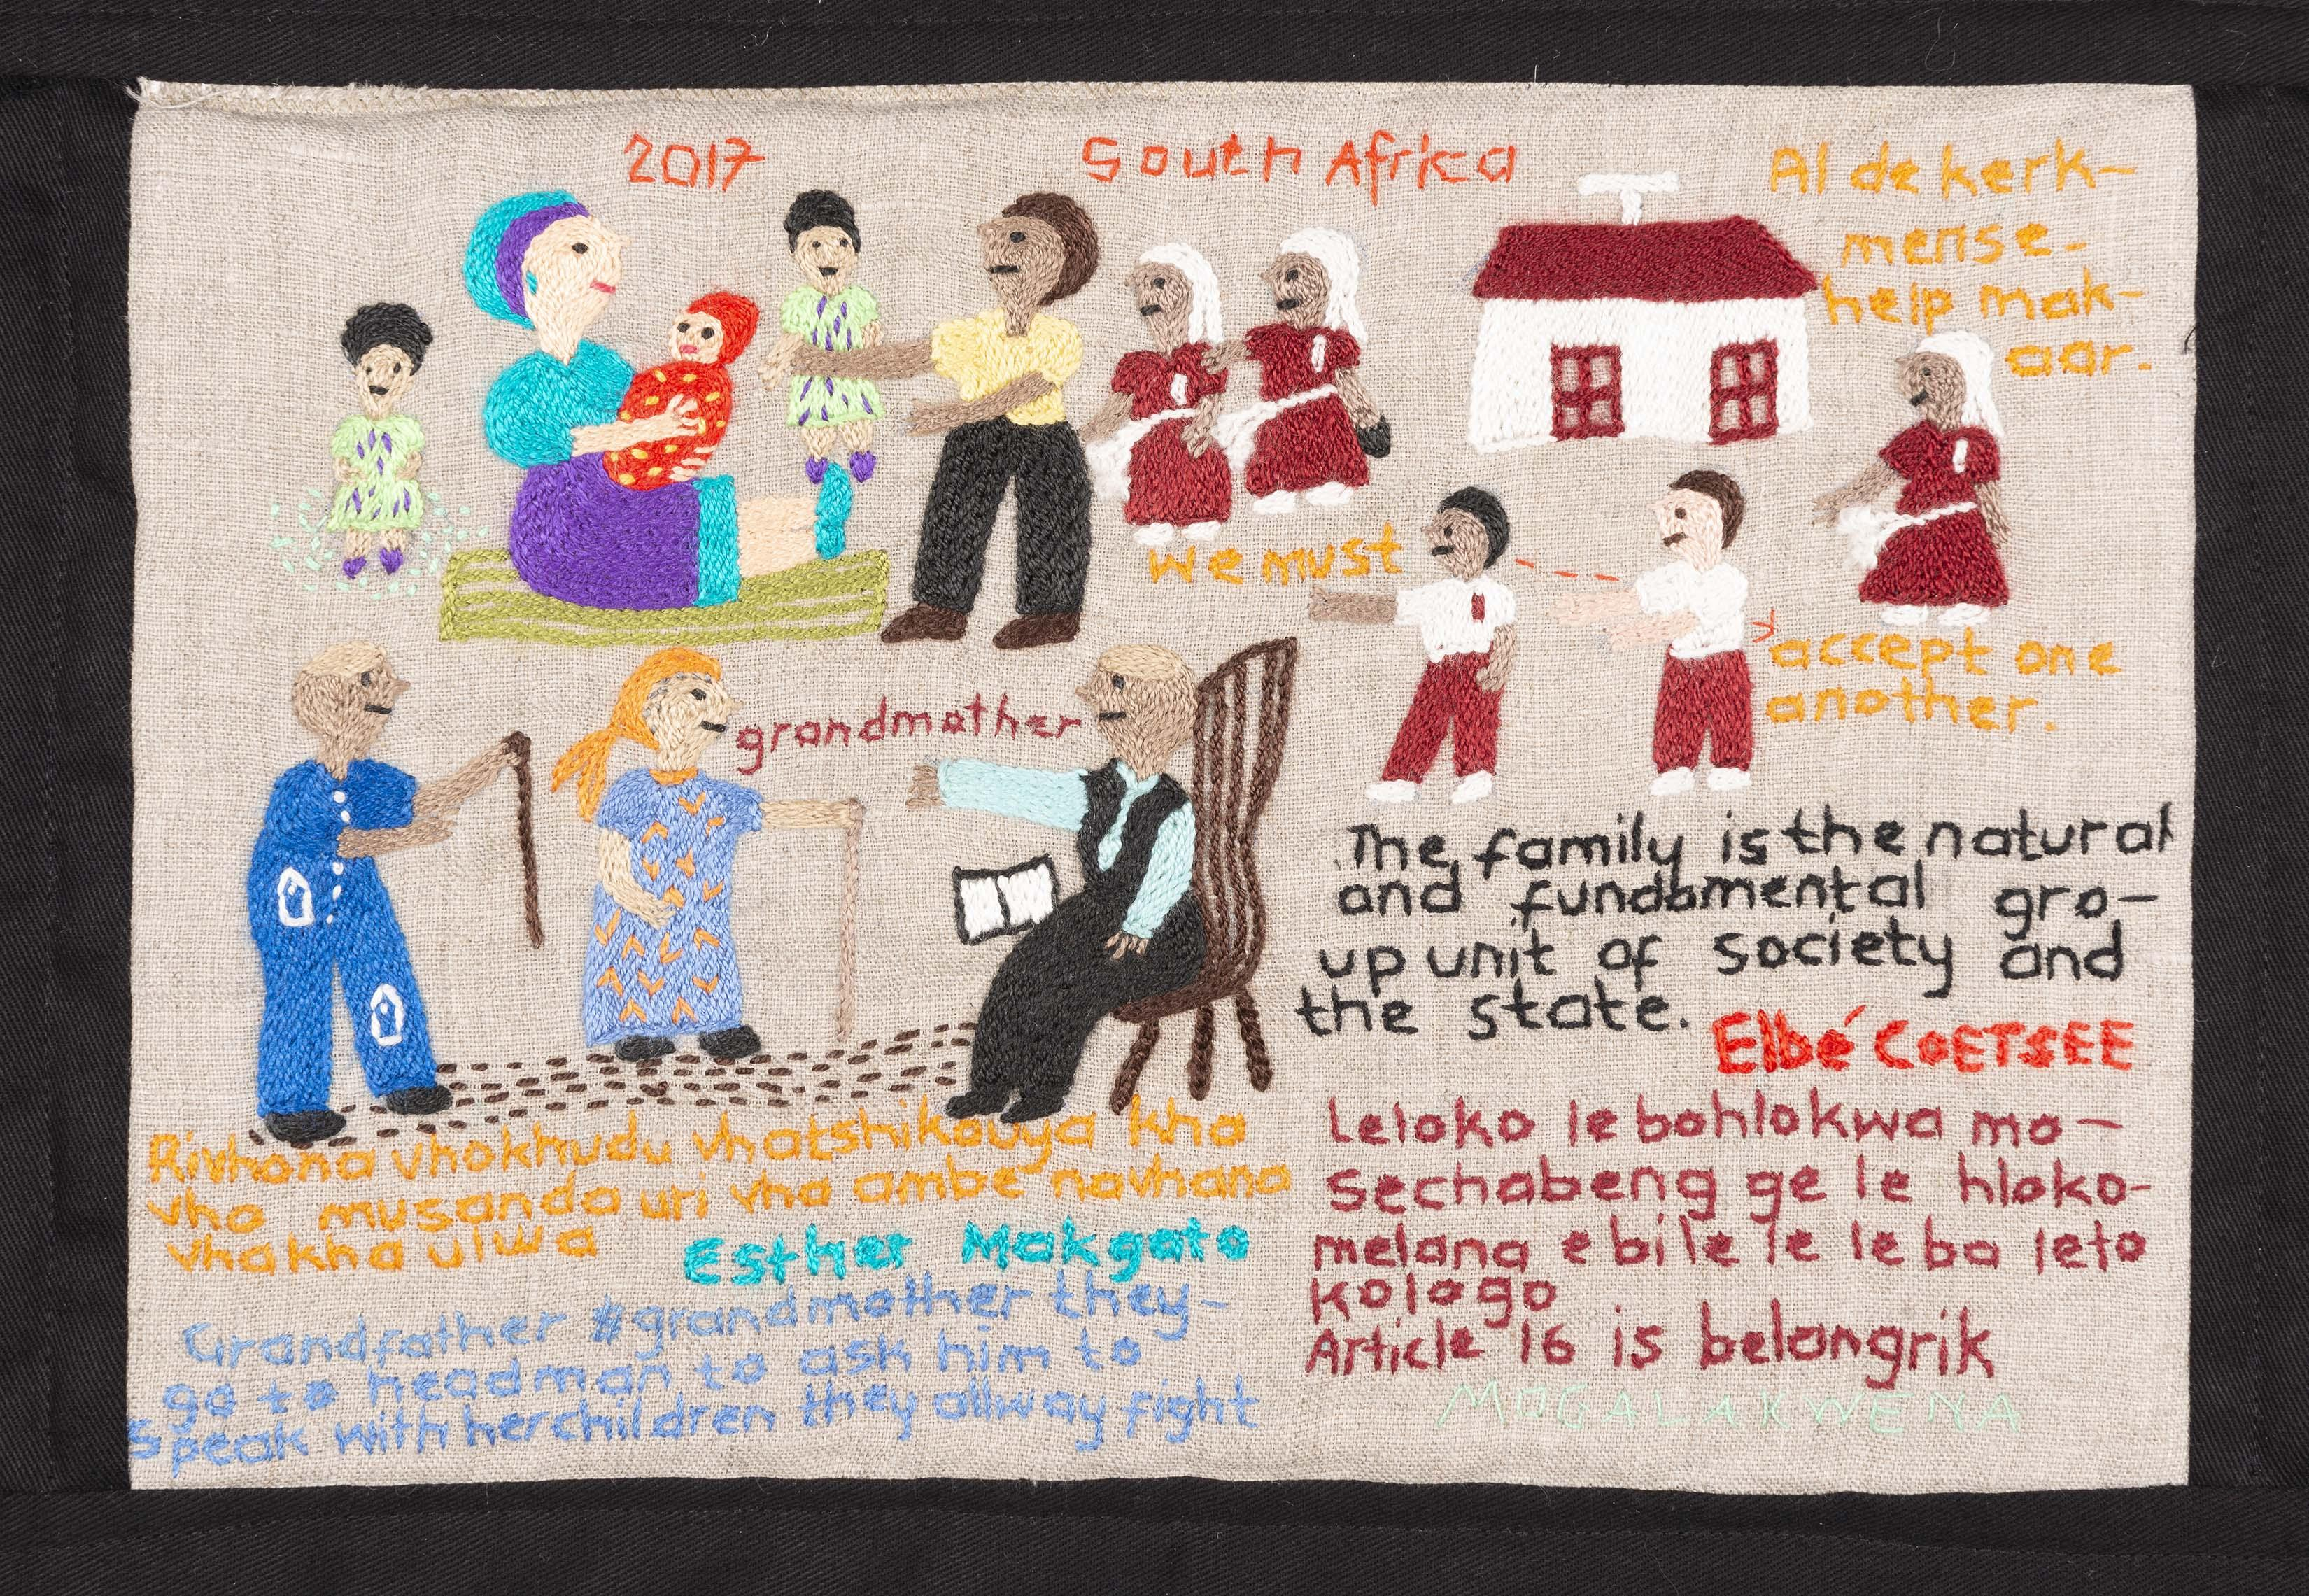 Mogalakwena - UDHR Article 16   UDHR Quilts